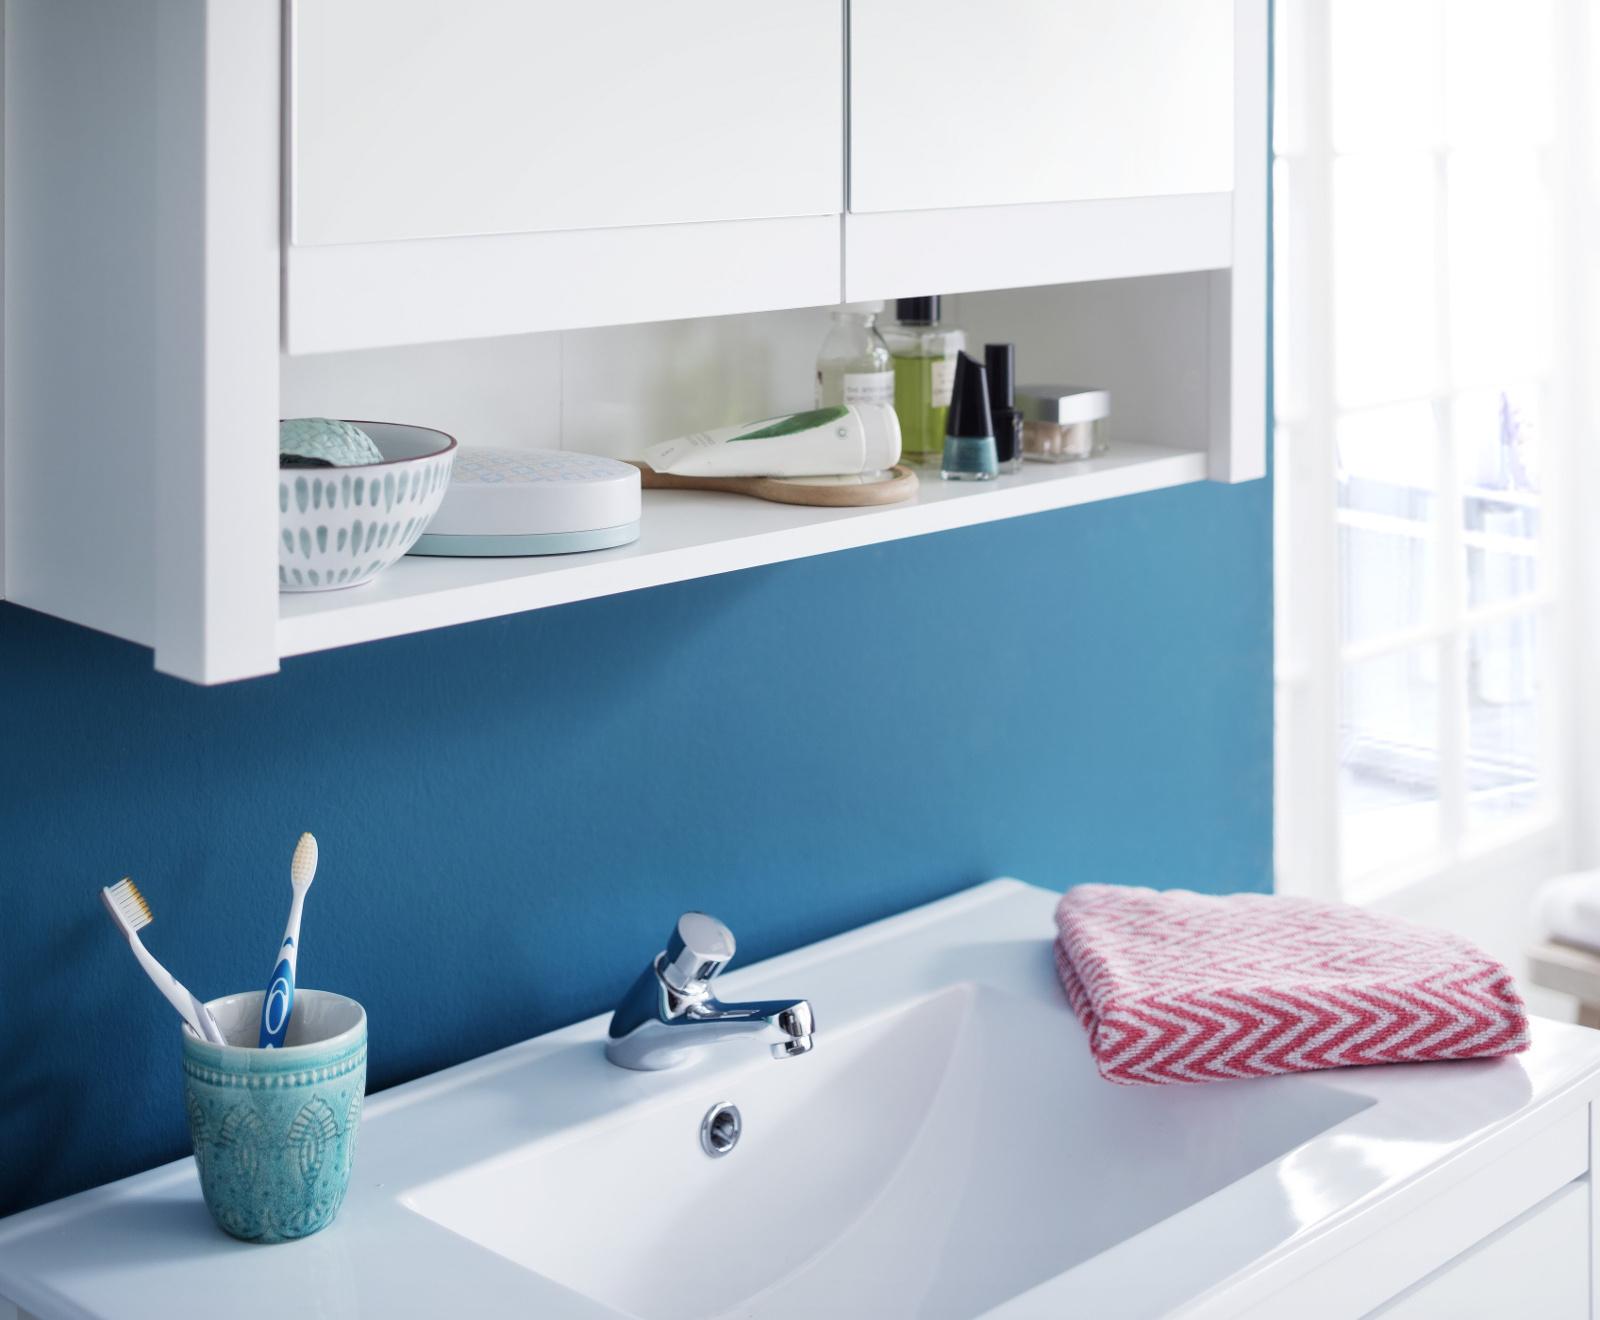 spiegelschrank ole in wei inkl led aufsatzleuchte. Black Bedroom Furniture Sets. Home Design Ideas